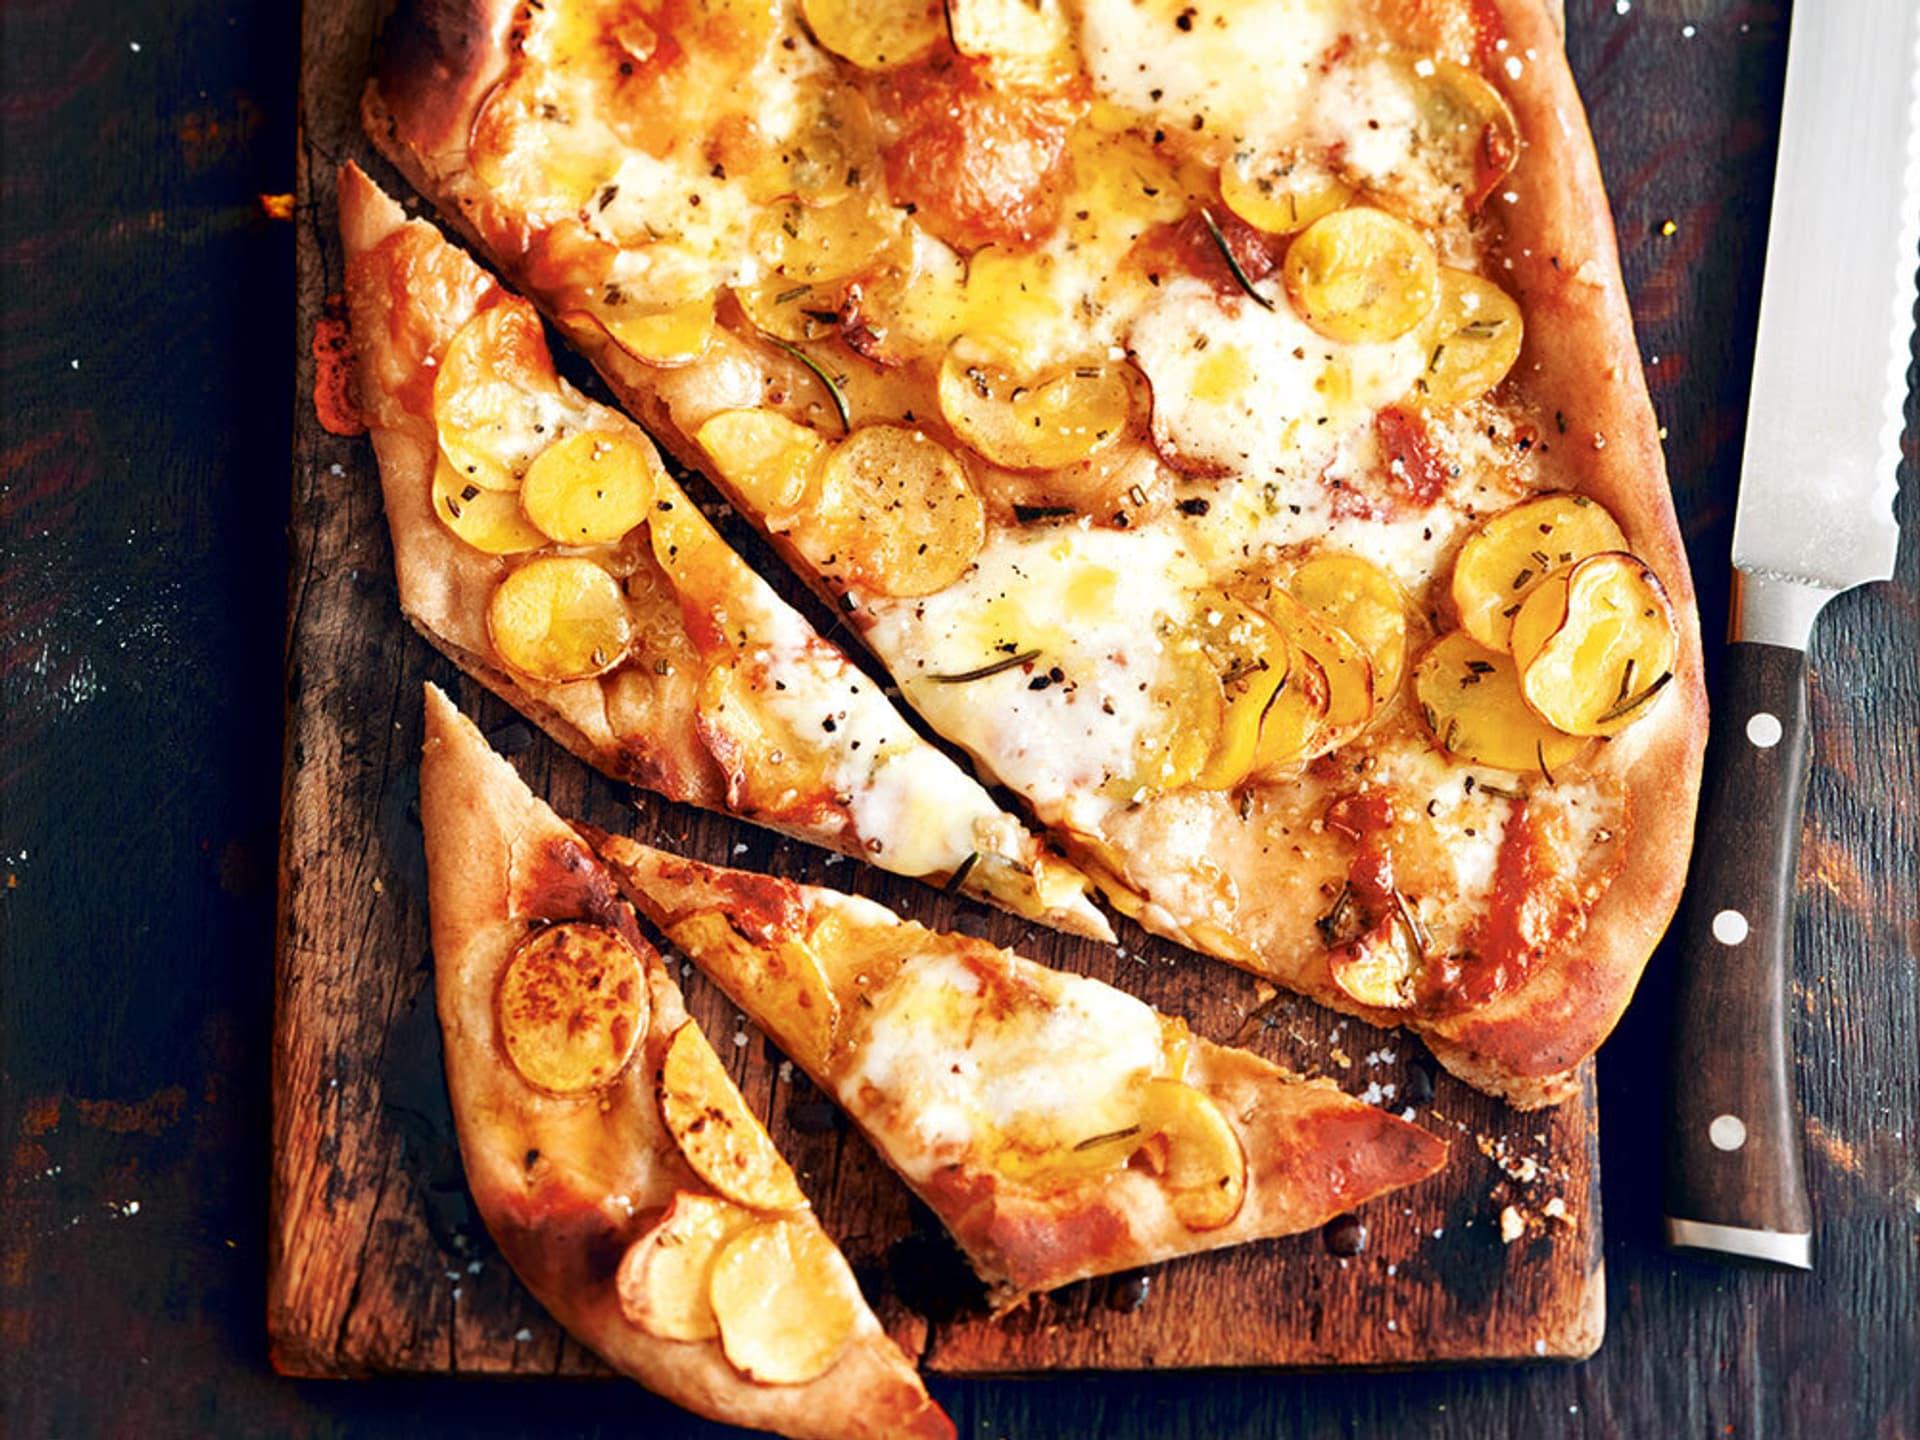 Kartoffel-Knoblauch-Pizza